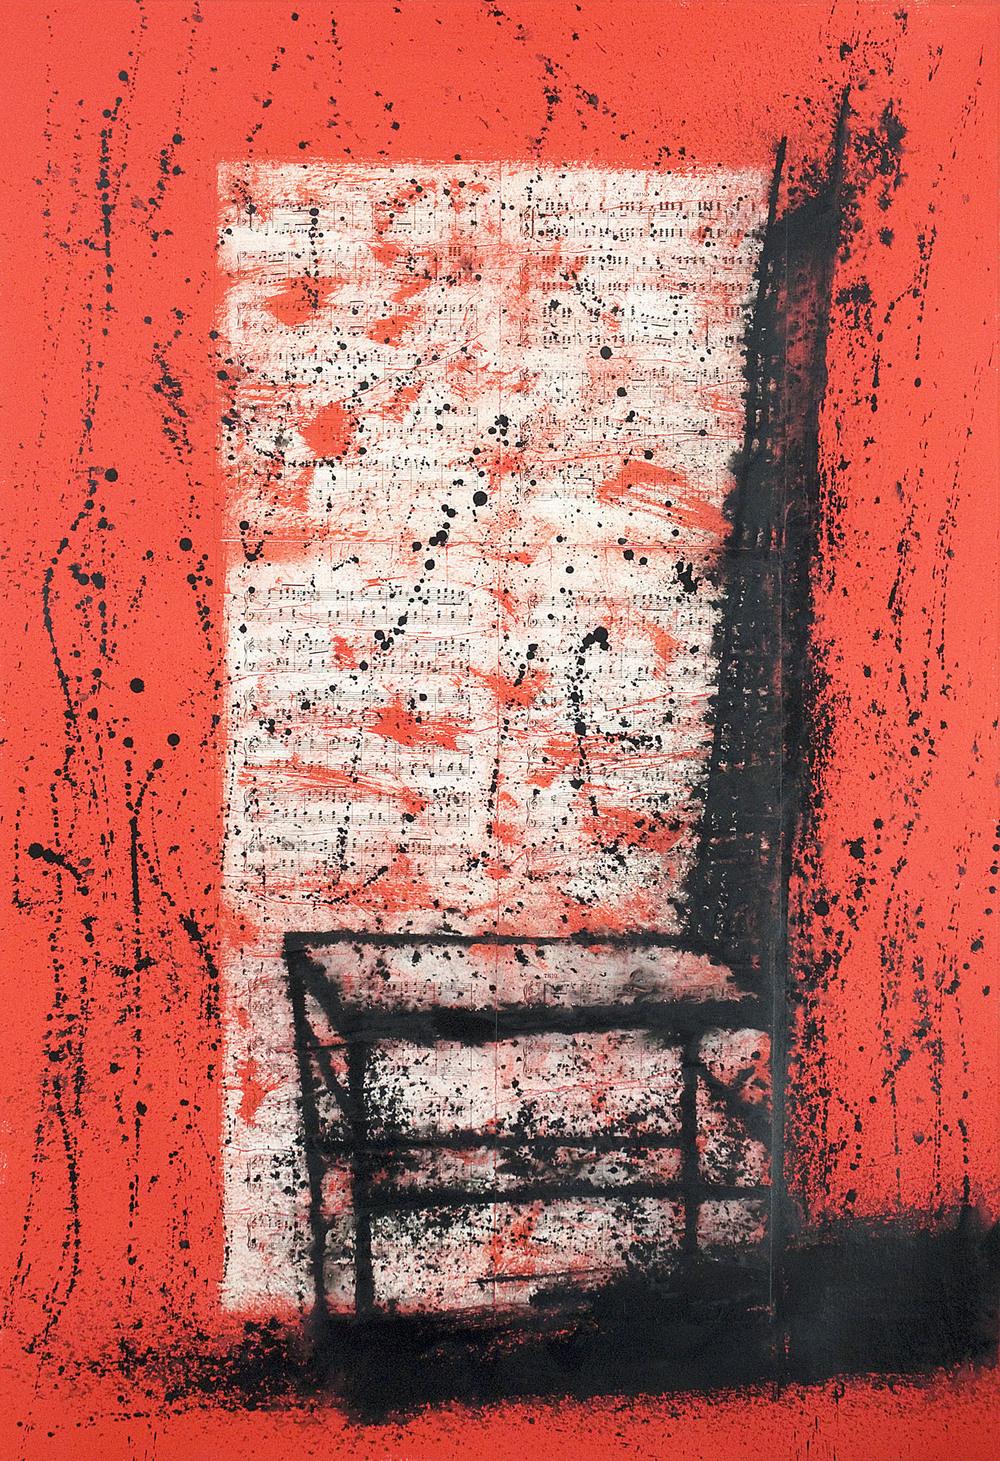 Neil Shawcross_-_#16_acrylic on paper_132 x 91.5cm.jpg